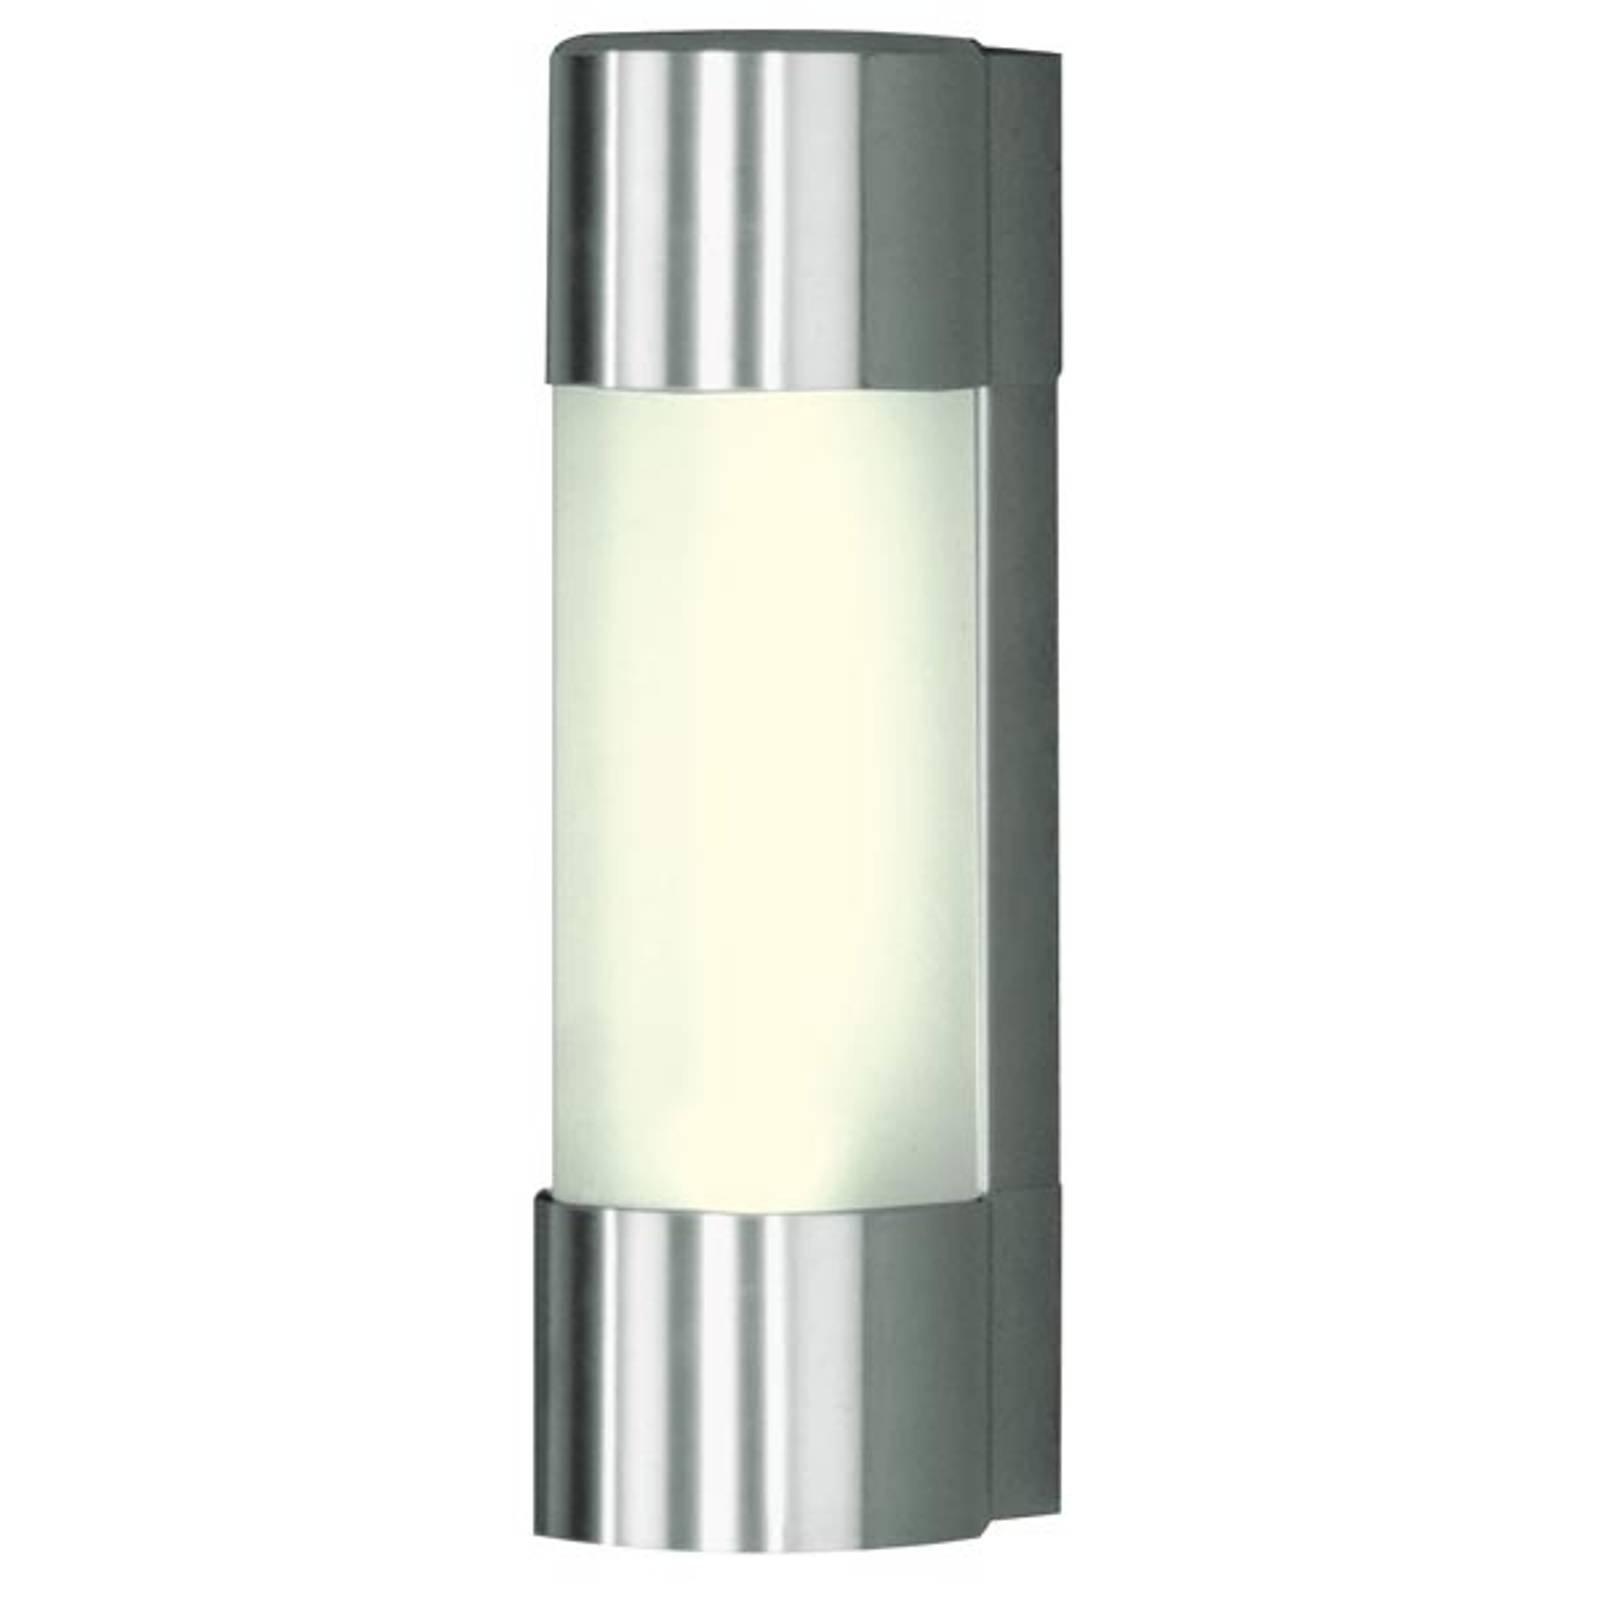 Vegglampe NEPTO